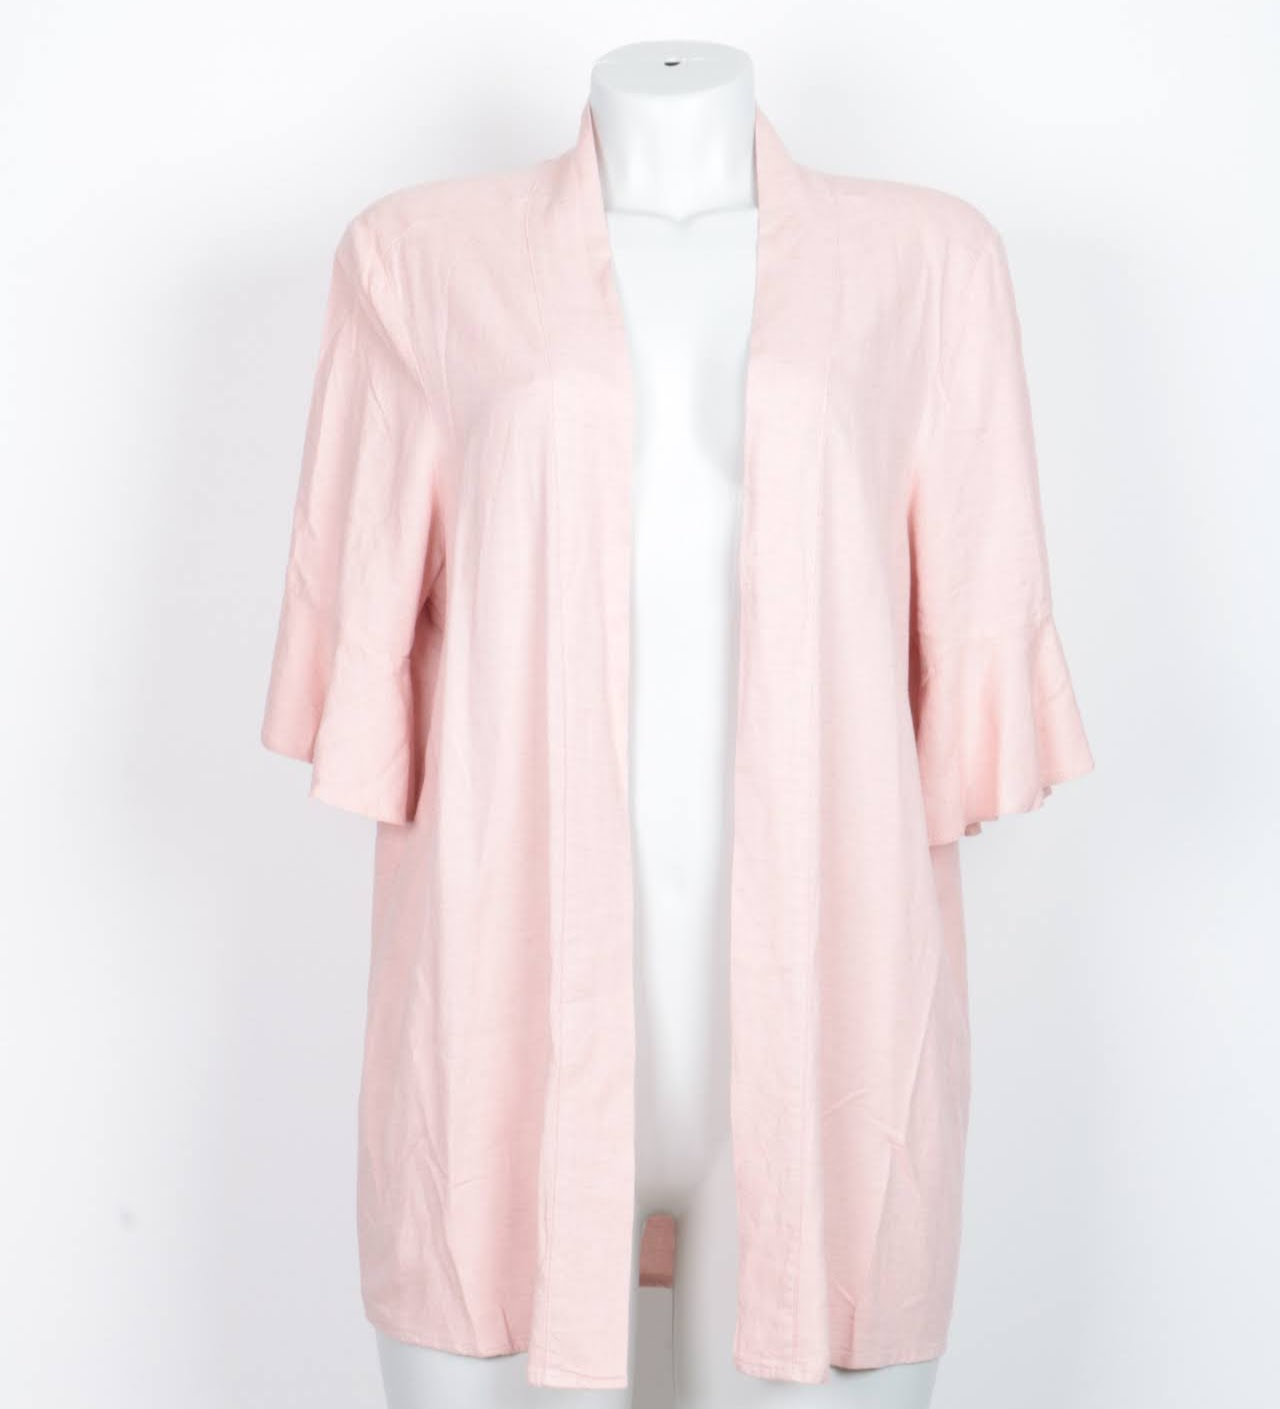 Kimono - Hering - M